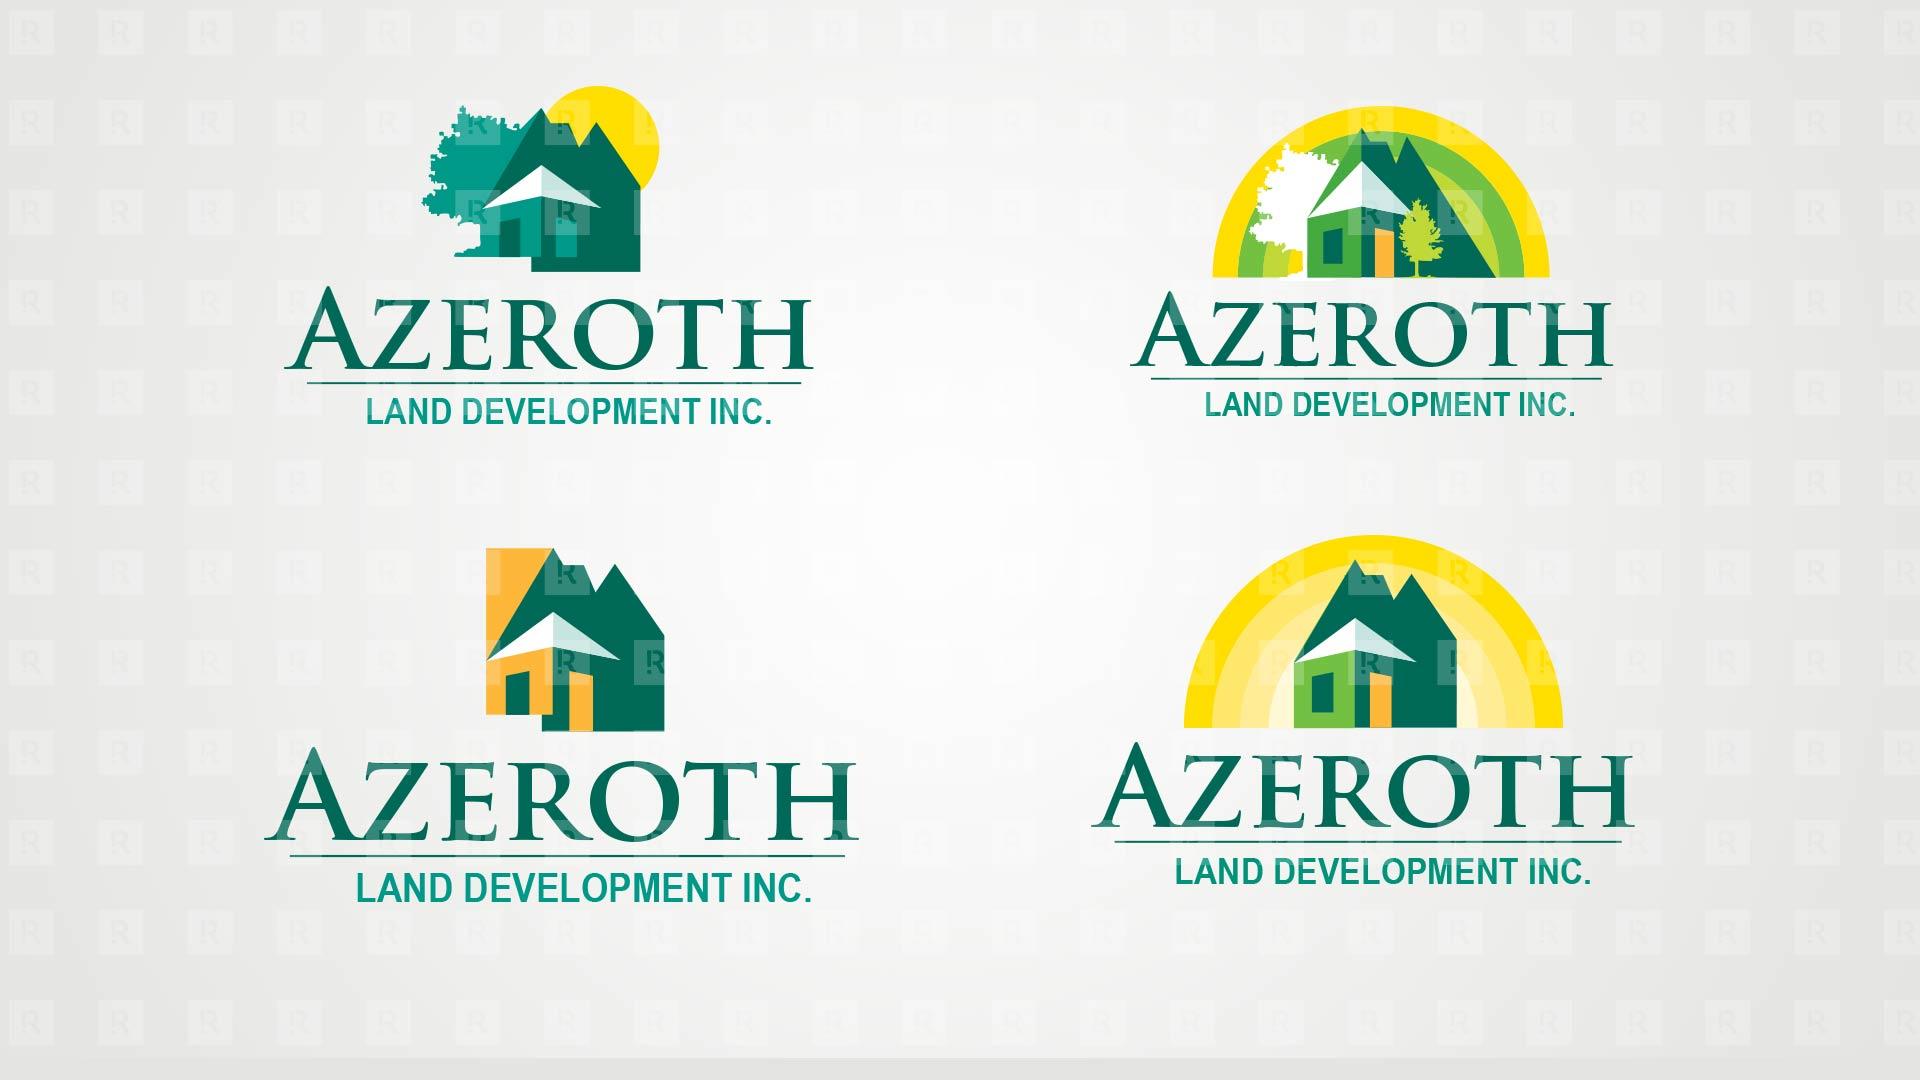 Azeroth Land Development Inc. Brand Identity studies